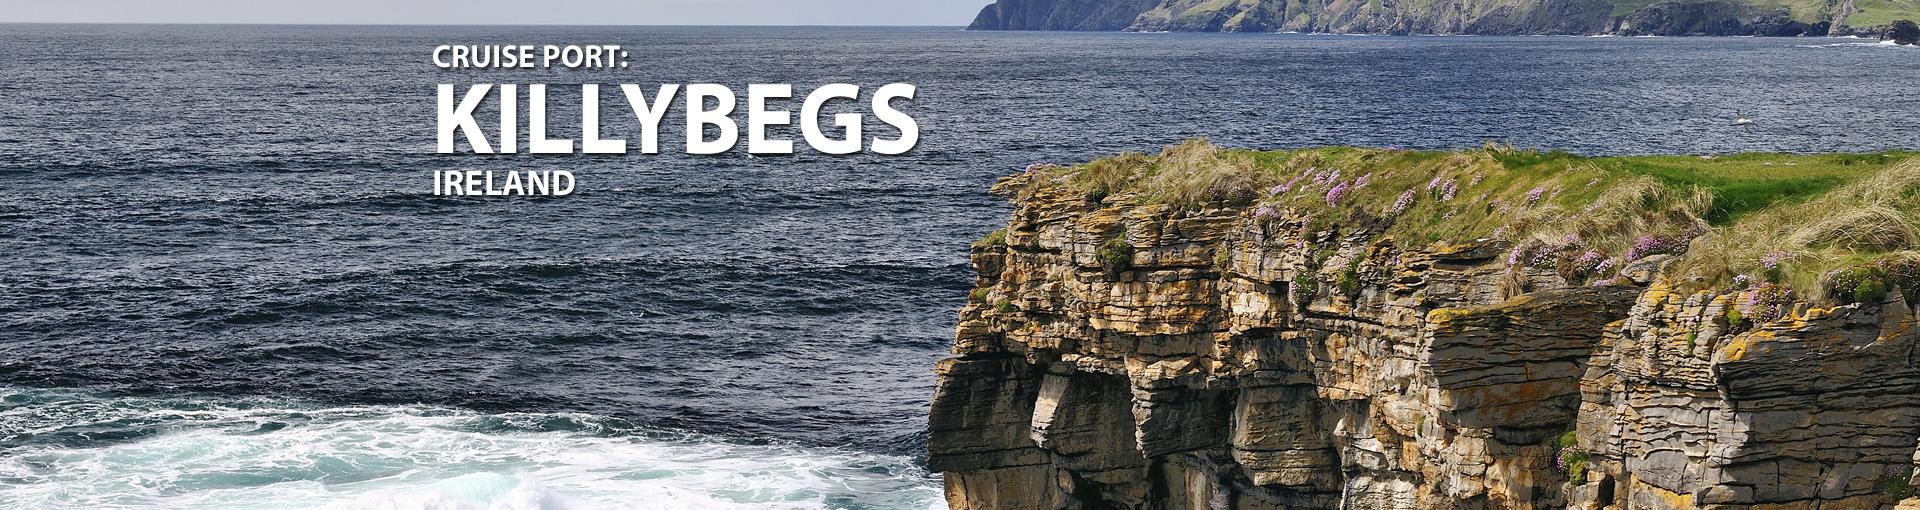 Cruises to Killybegs, Ireland